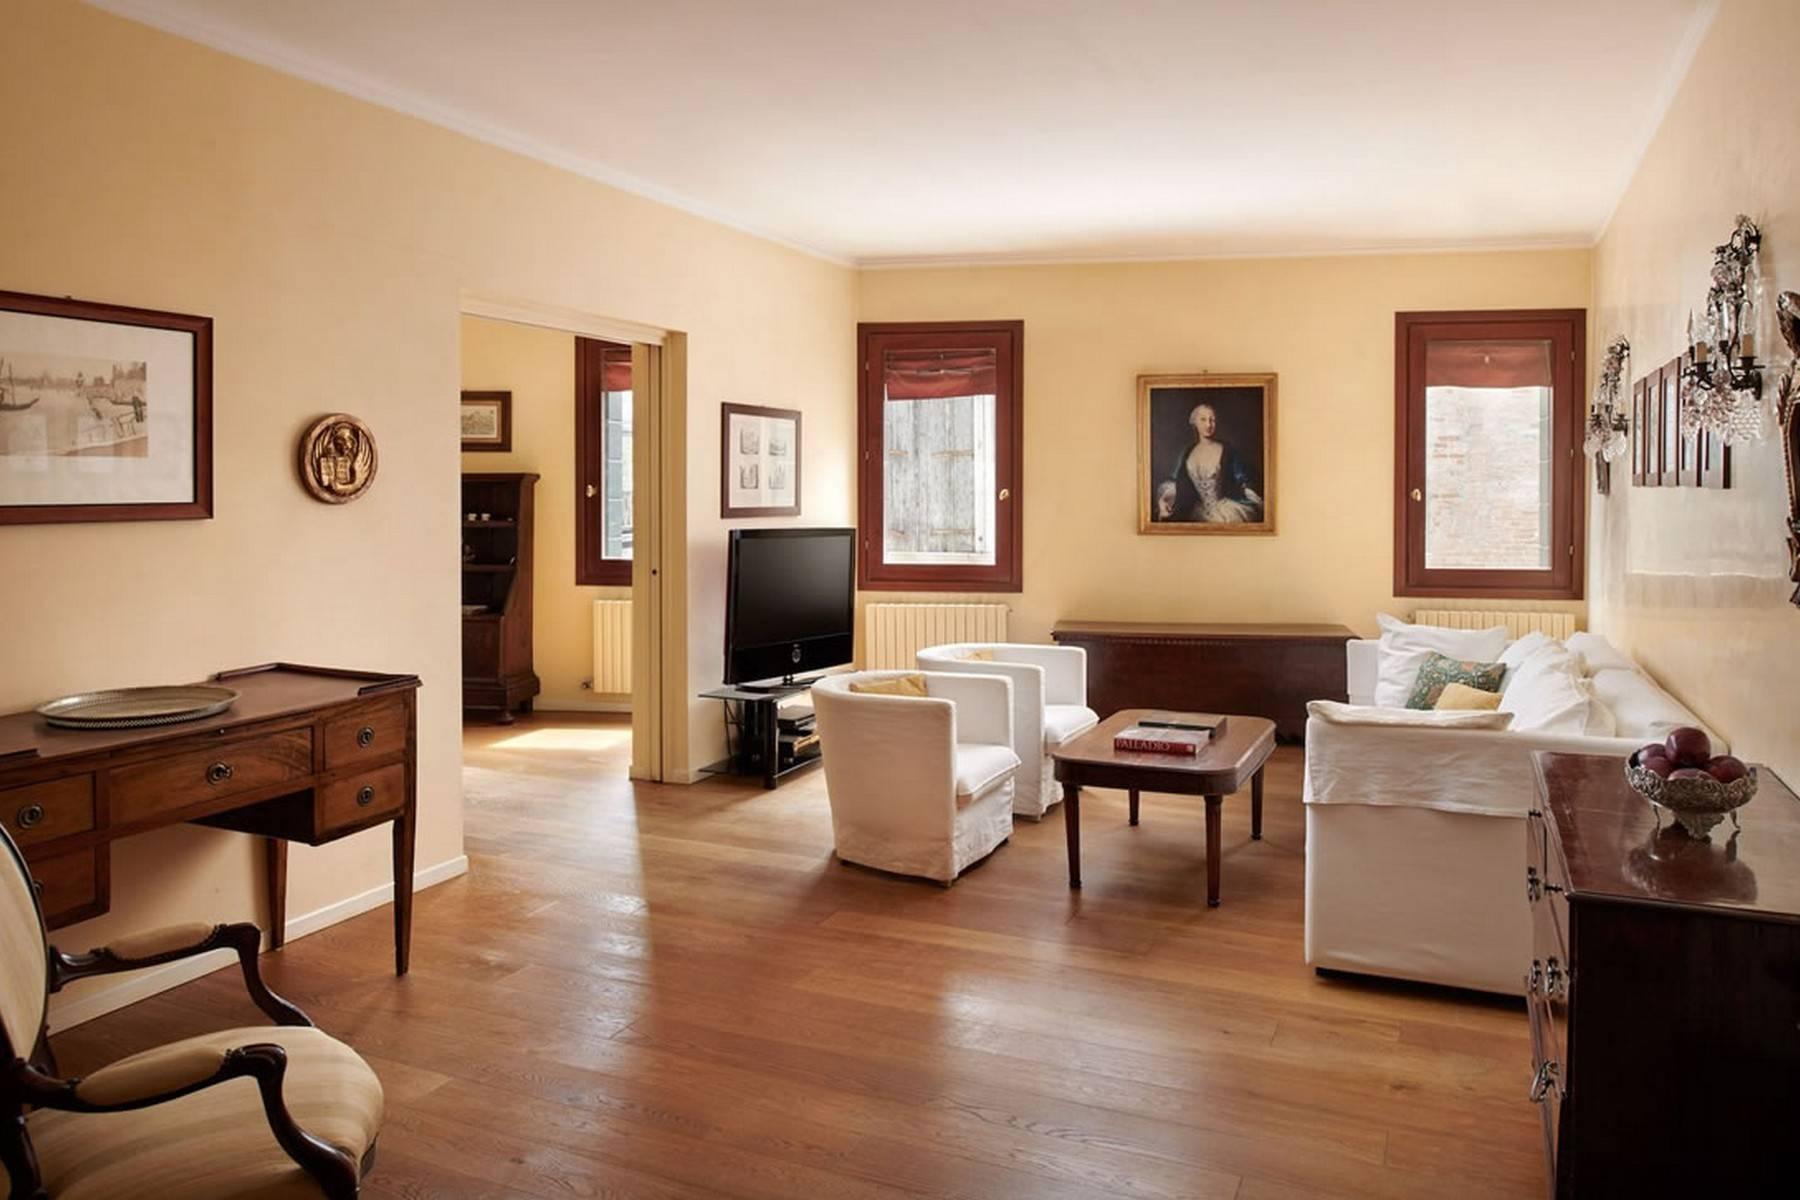 Appartement de design dans le Palazzo Querini Stampalia / S.M. Formosa - 10